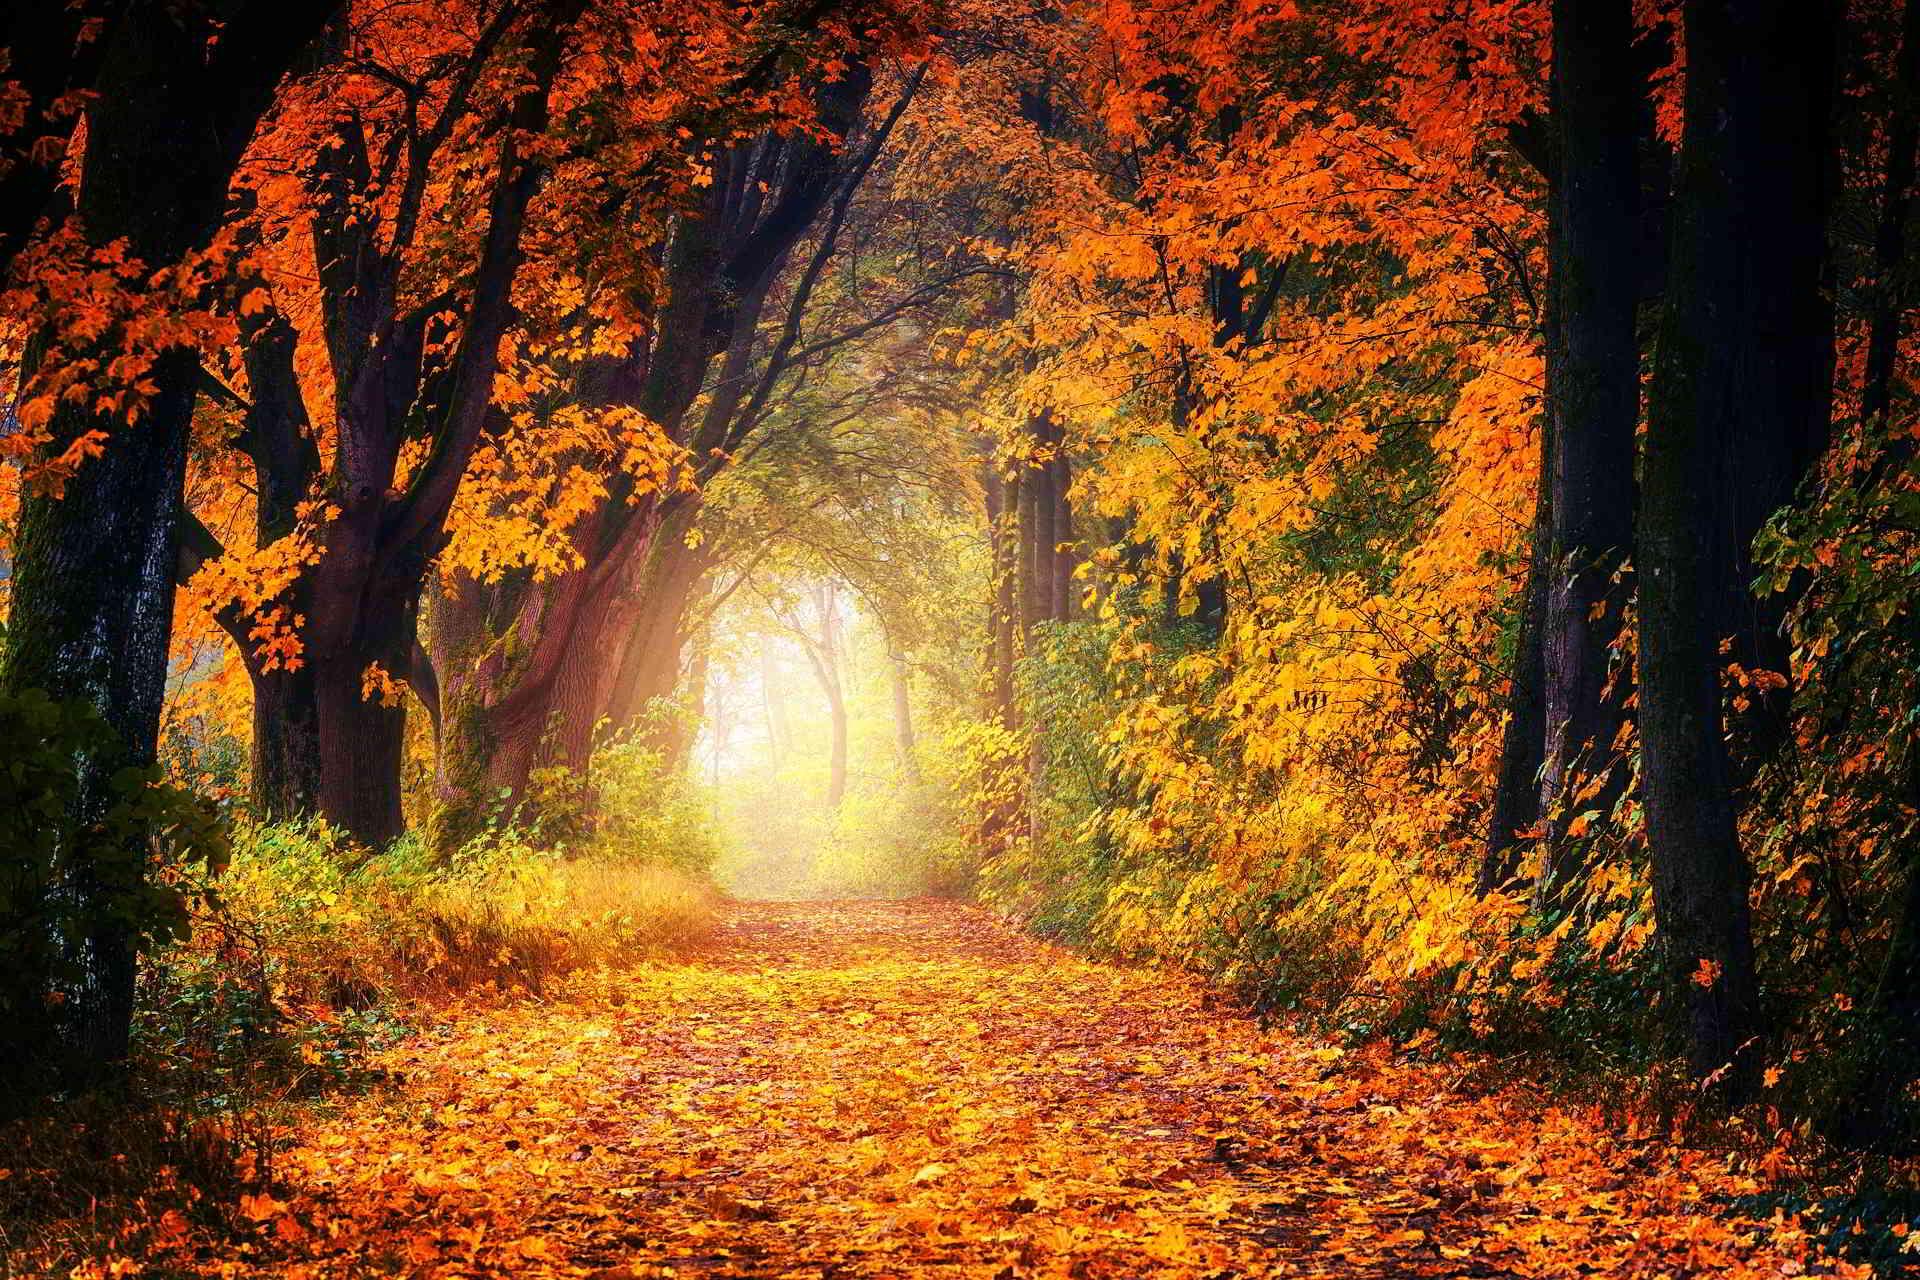 Autumn in France: Luxurious Ways to Enjoy It